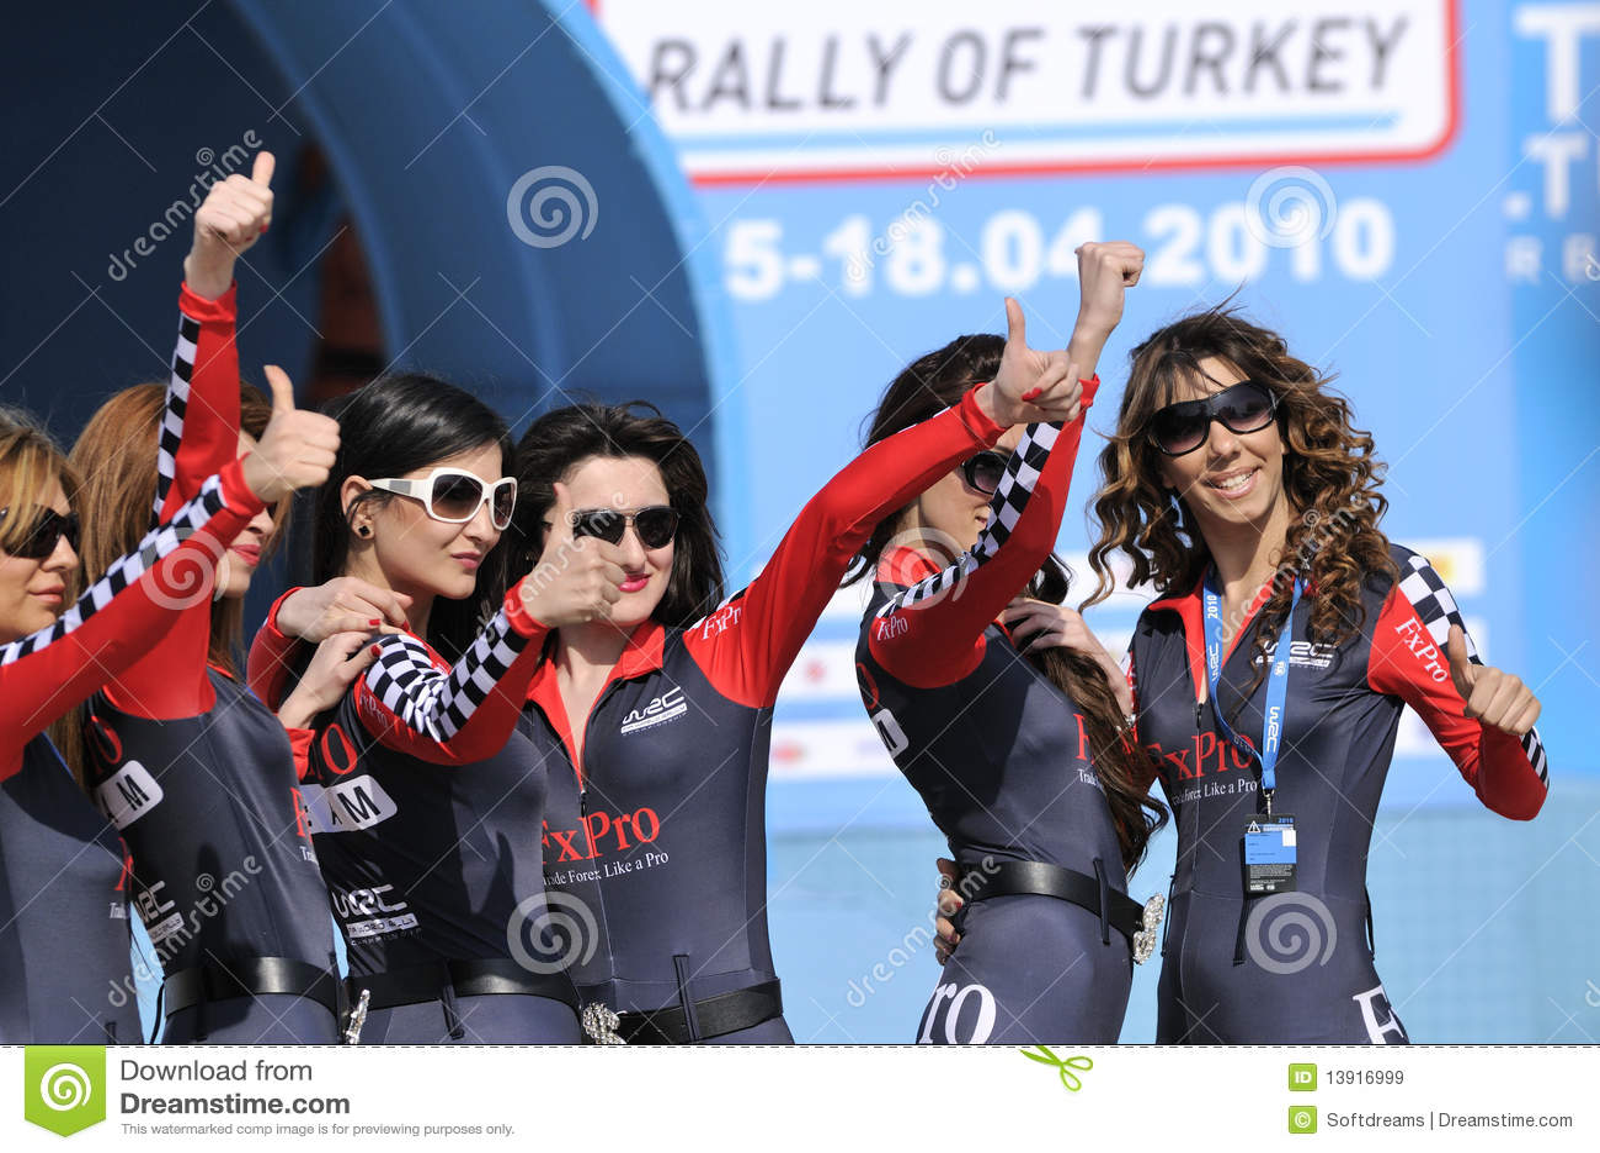 Wrc rally of turkey